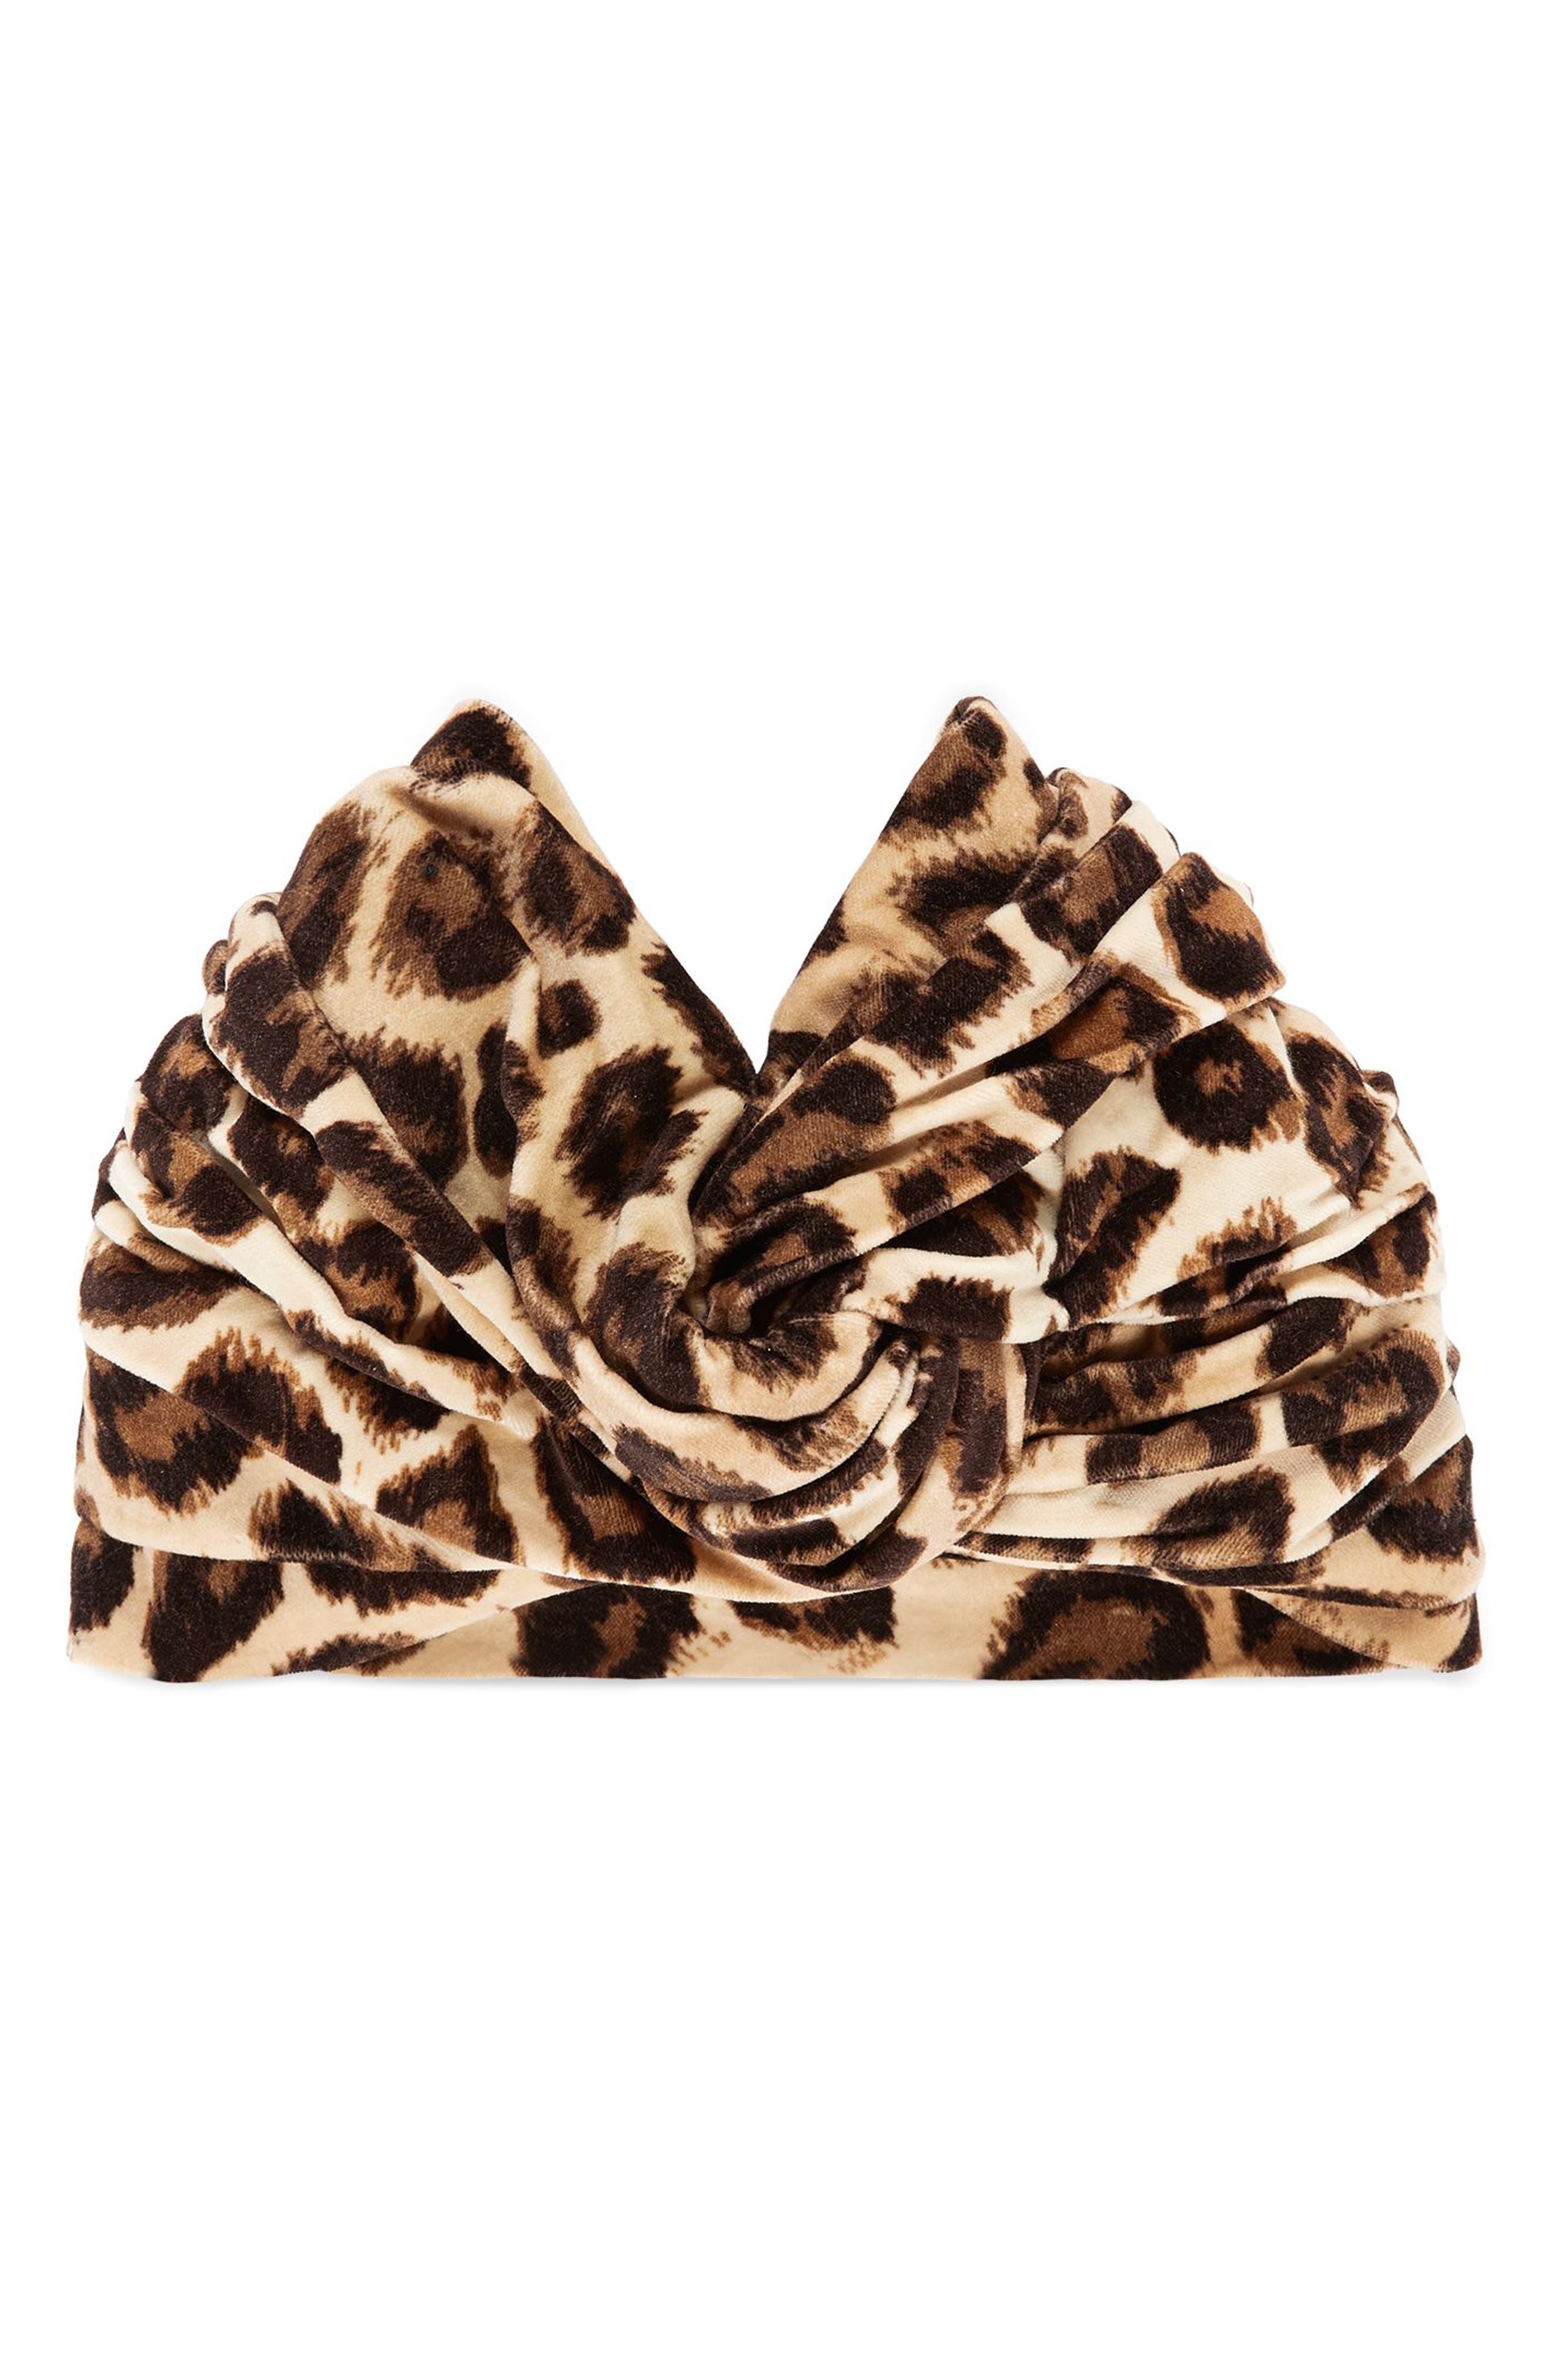 Lucileo Leopard Velvet Turban Headband,                             Main thumbnail 1, color,                             Beige/ Black